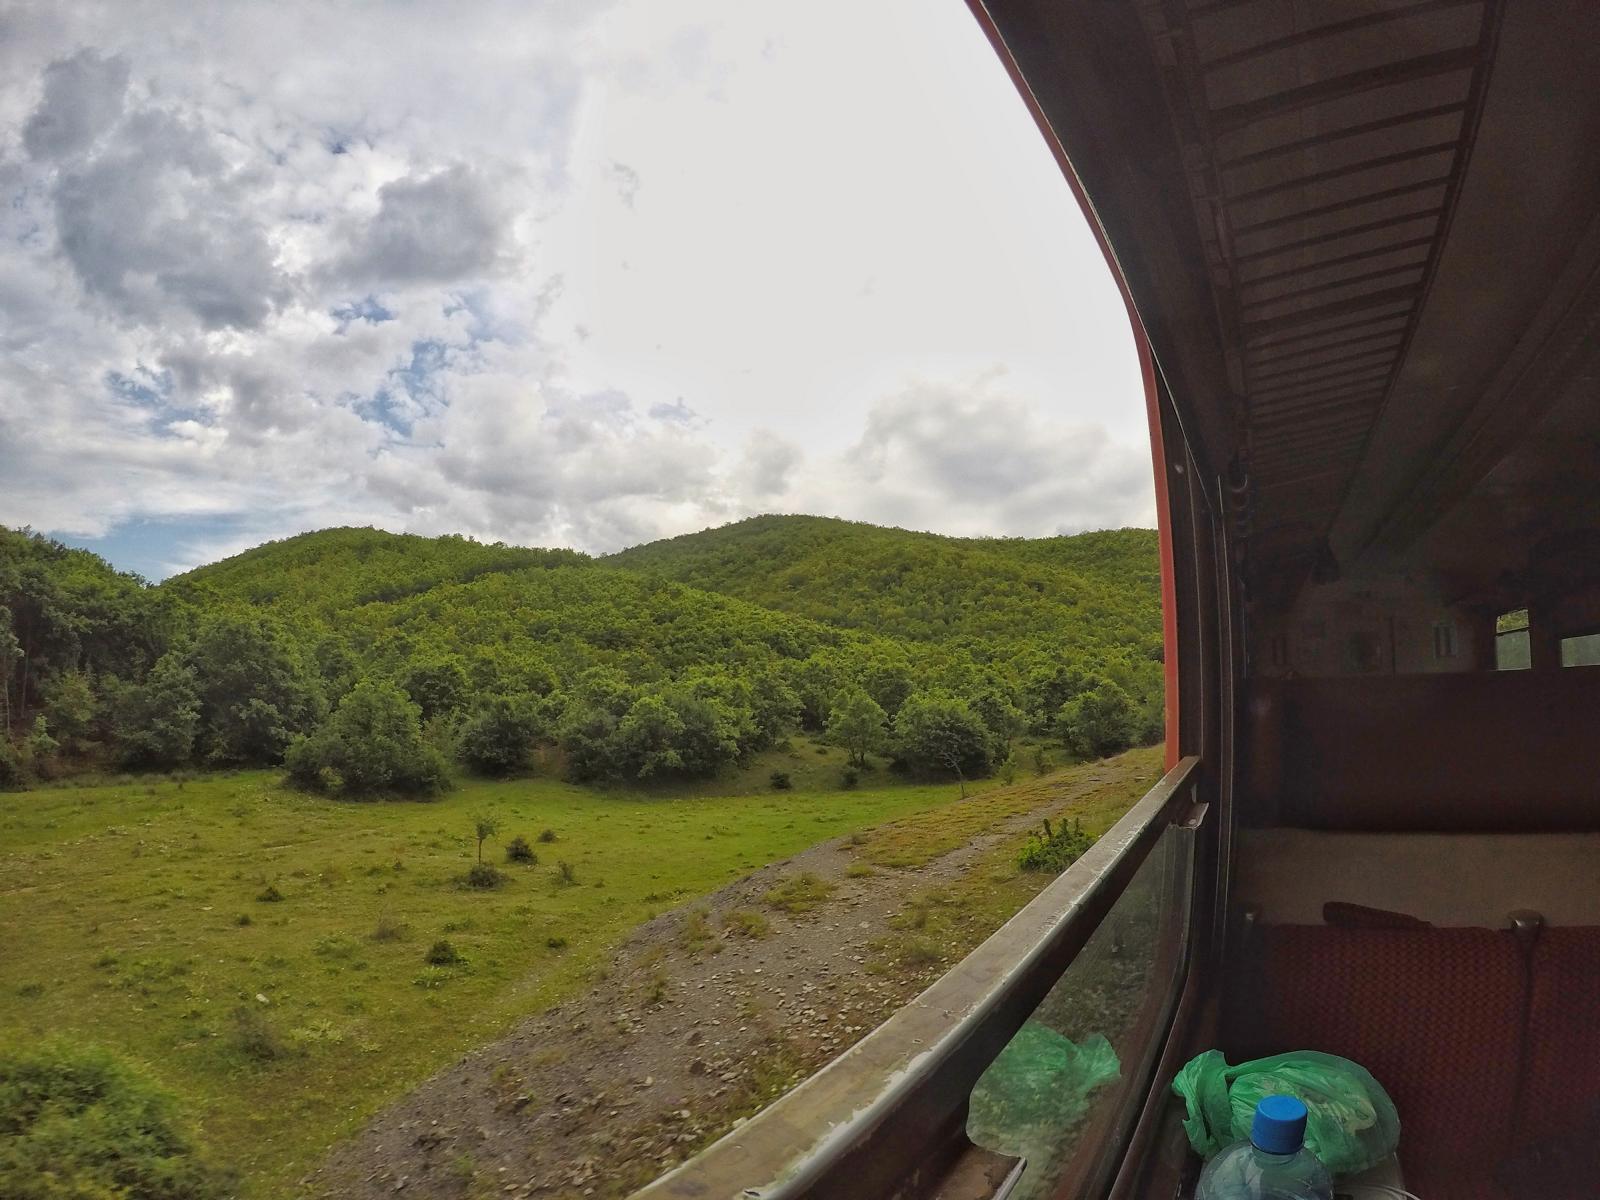 Im Zug von Pristina nach Peja im Kosovo